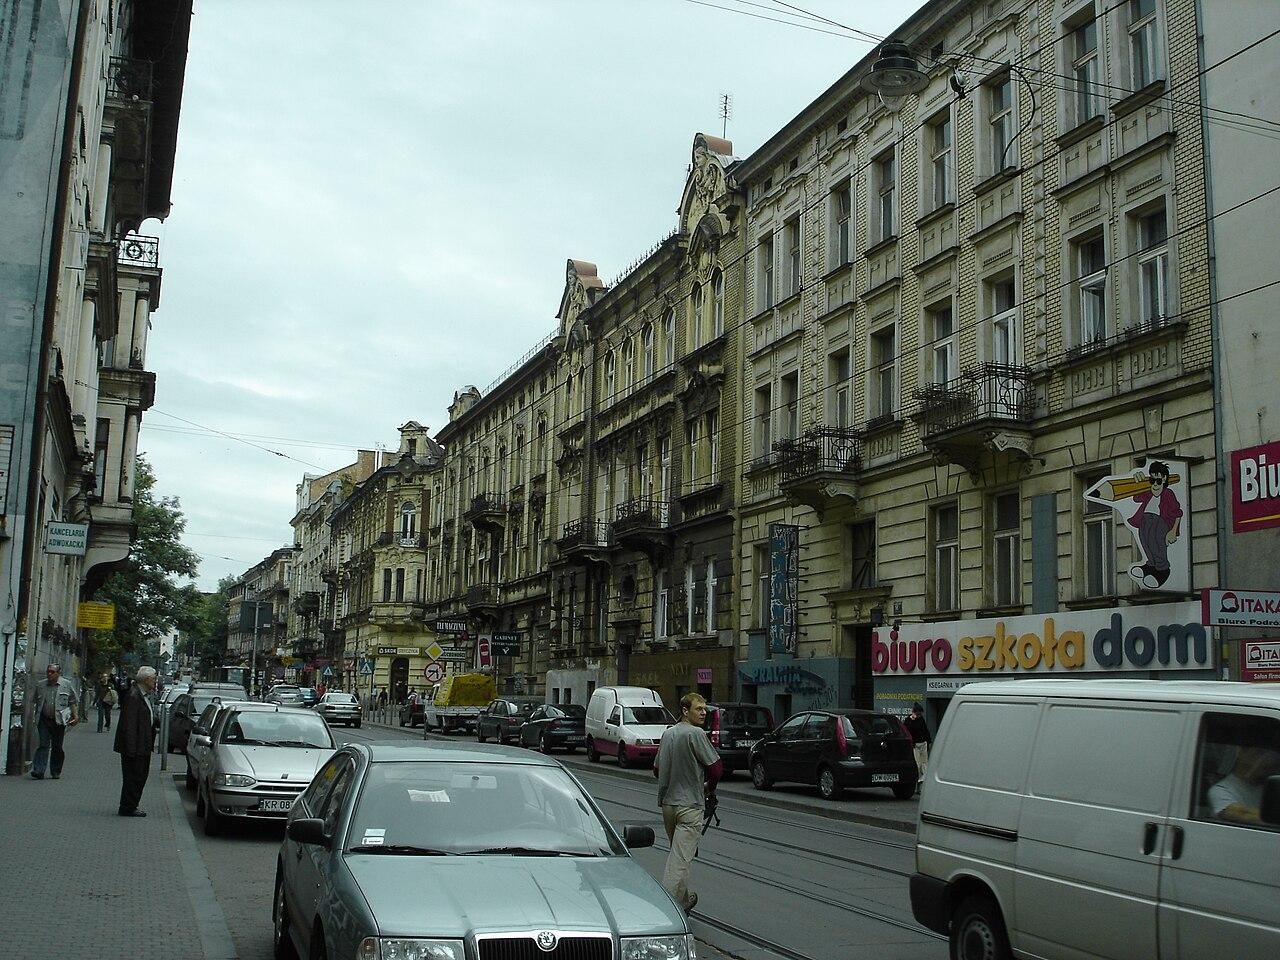 Ulica Karmelicka